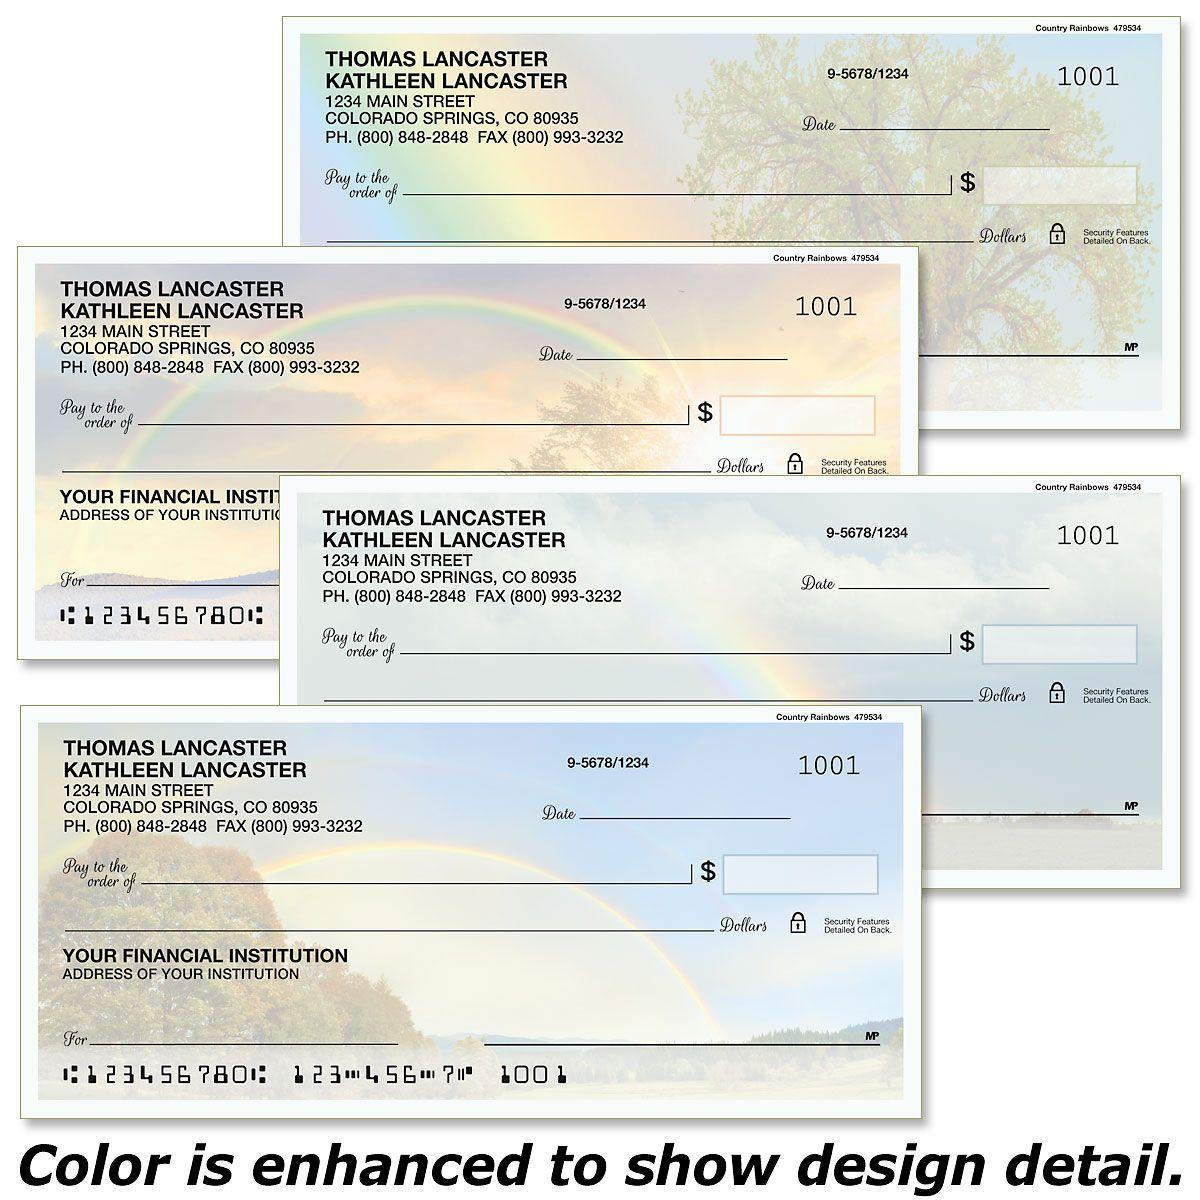 Country Rainbows Single Checks